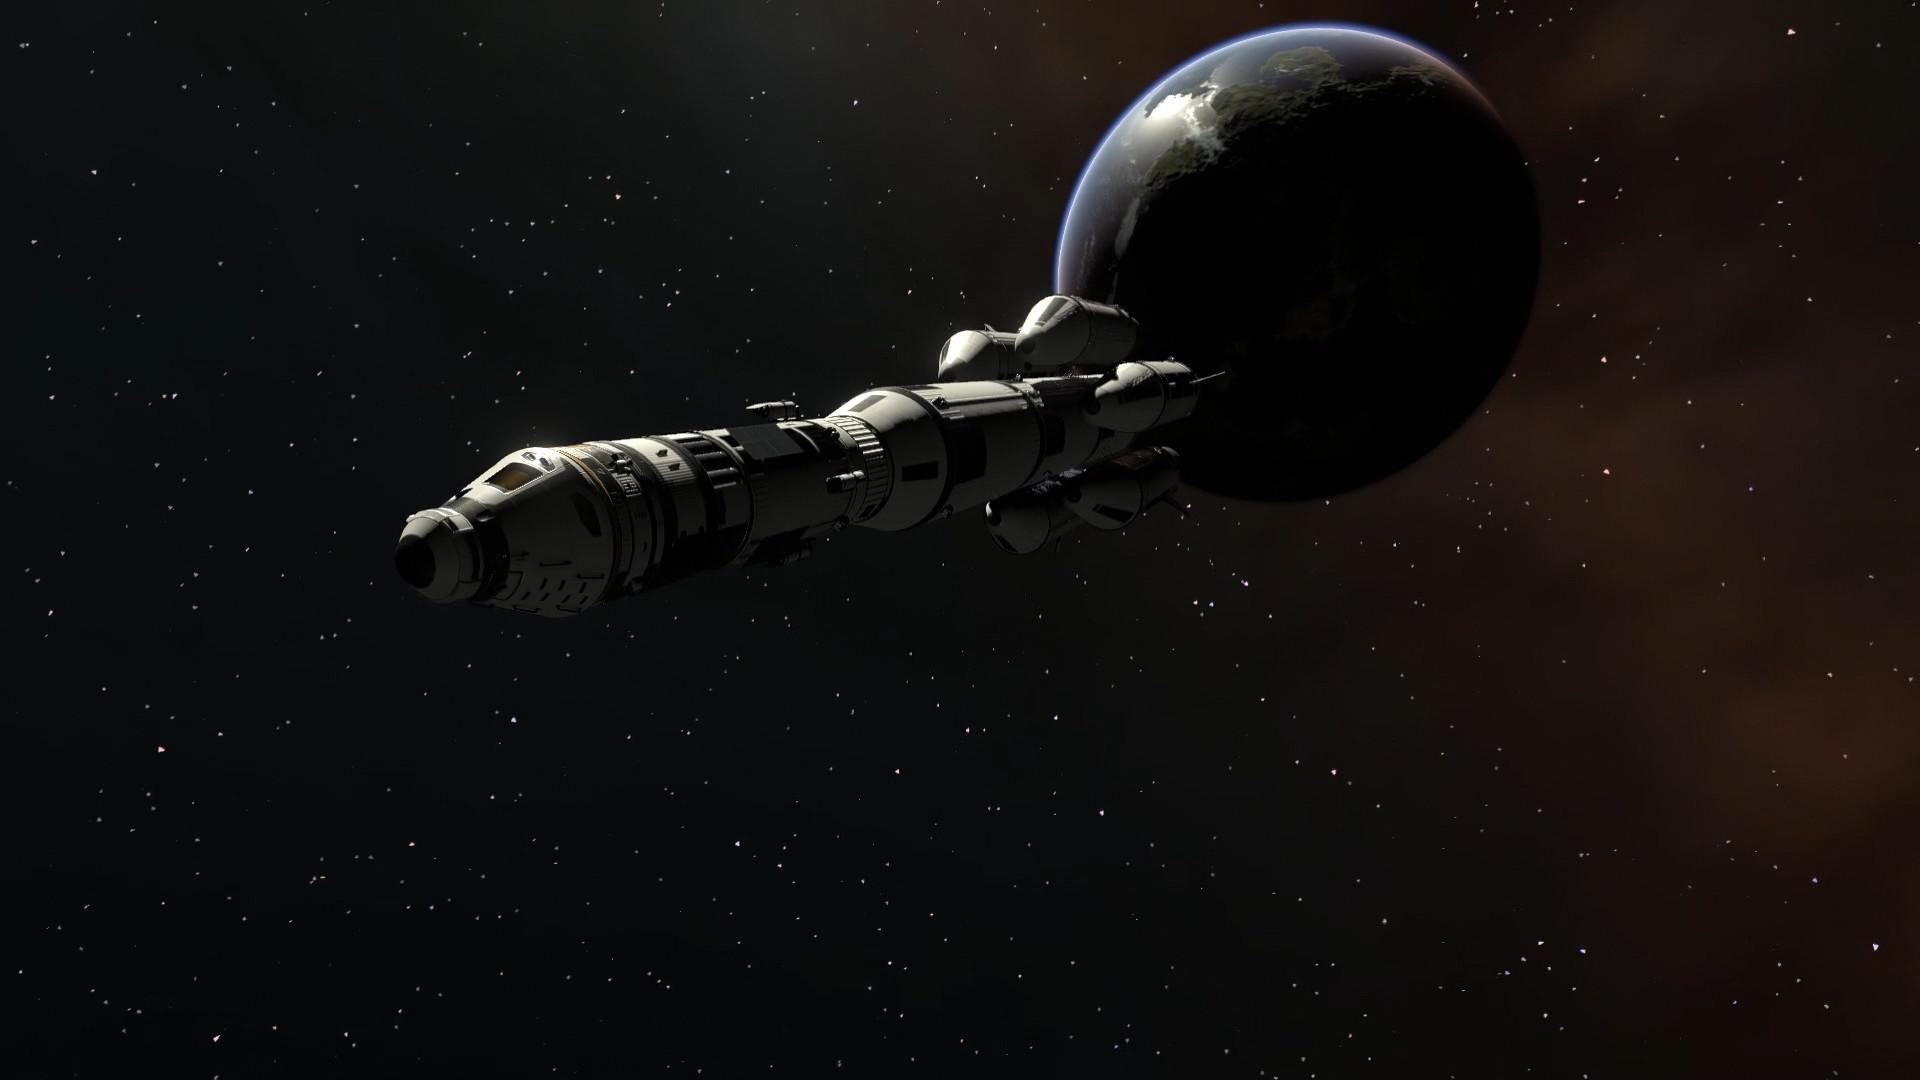 [Jeux] Kerbal Space Program 2 (2022) Ss_b4bd25ccc6b625bd22a6c7c8ae0244d66048e0d5.1920x1080